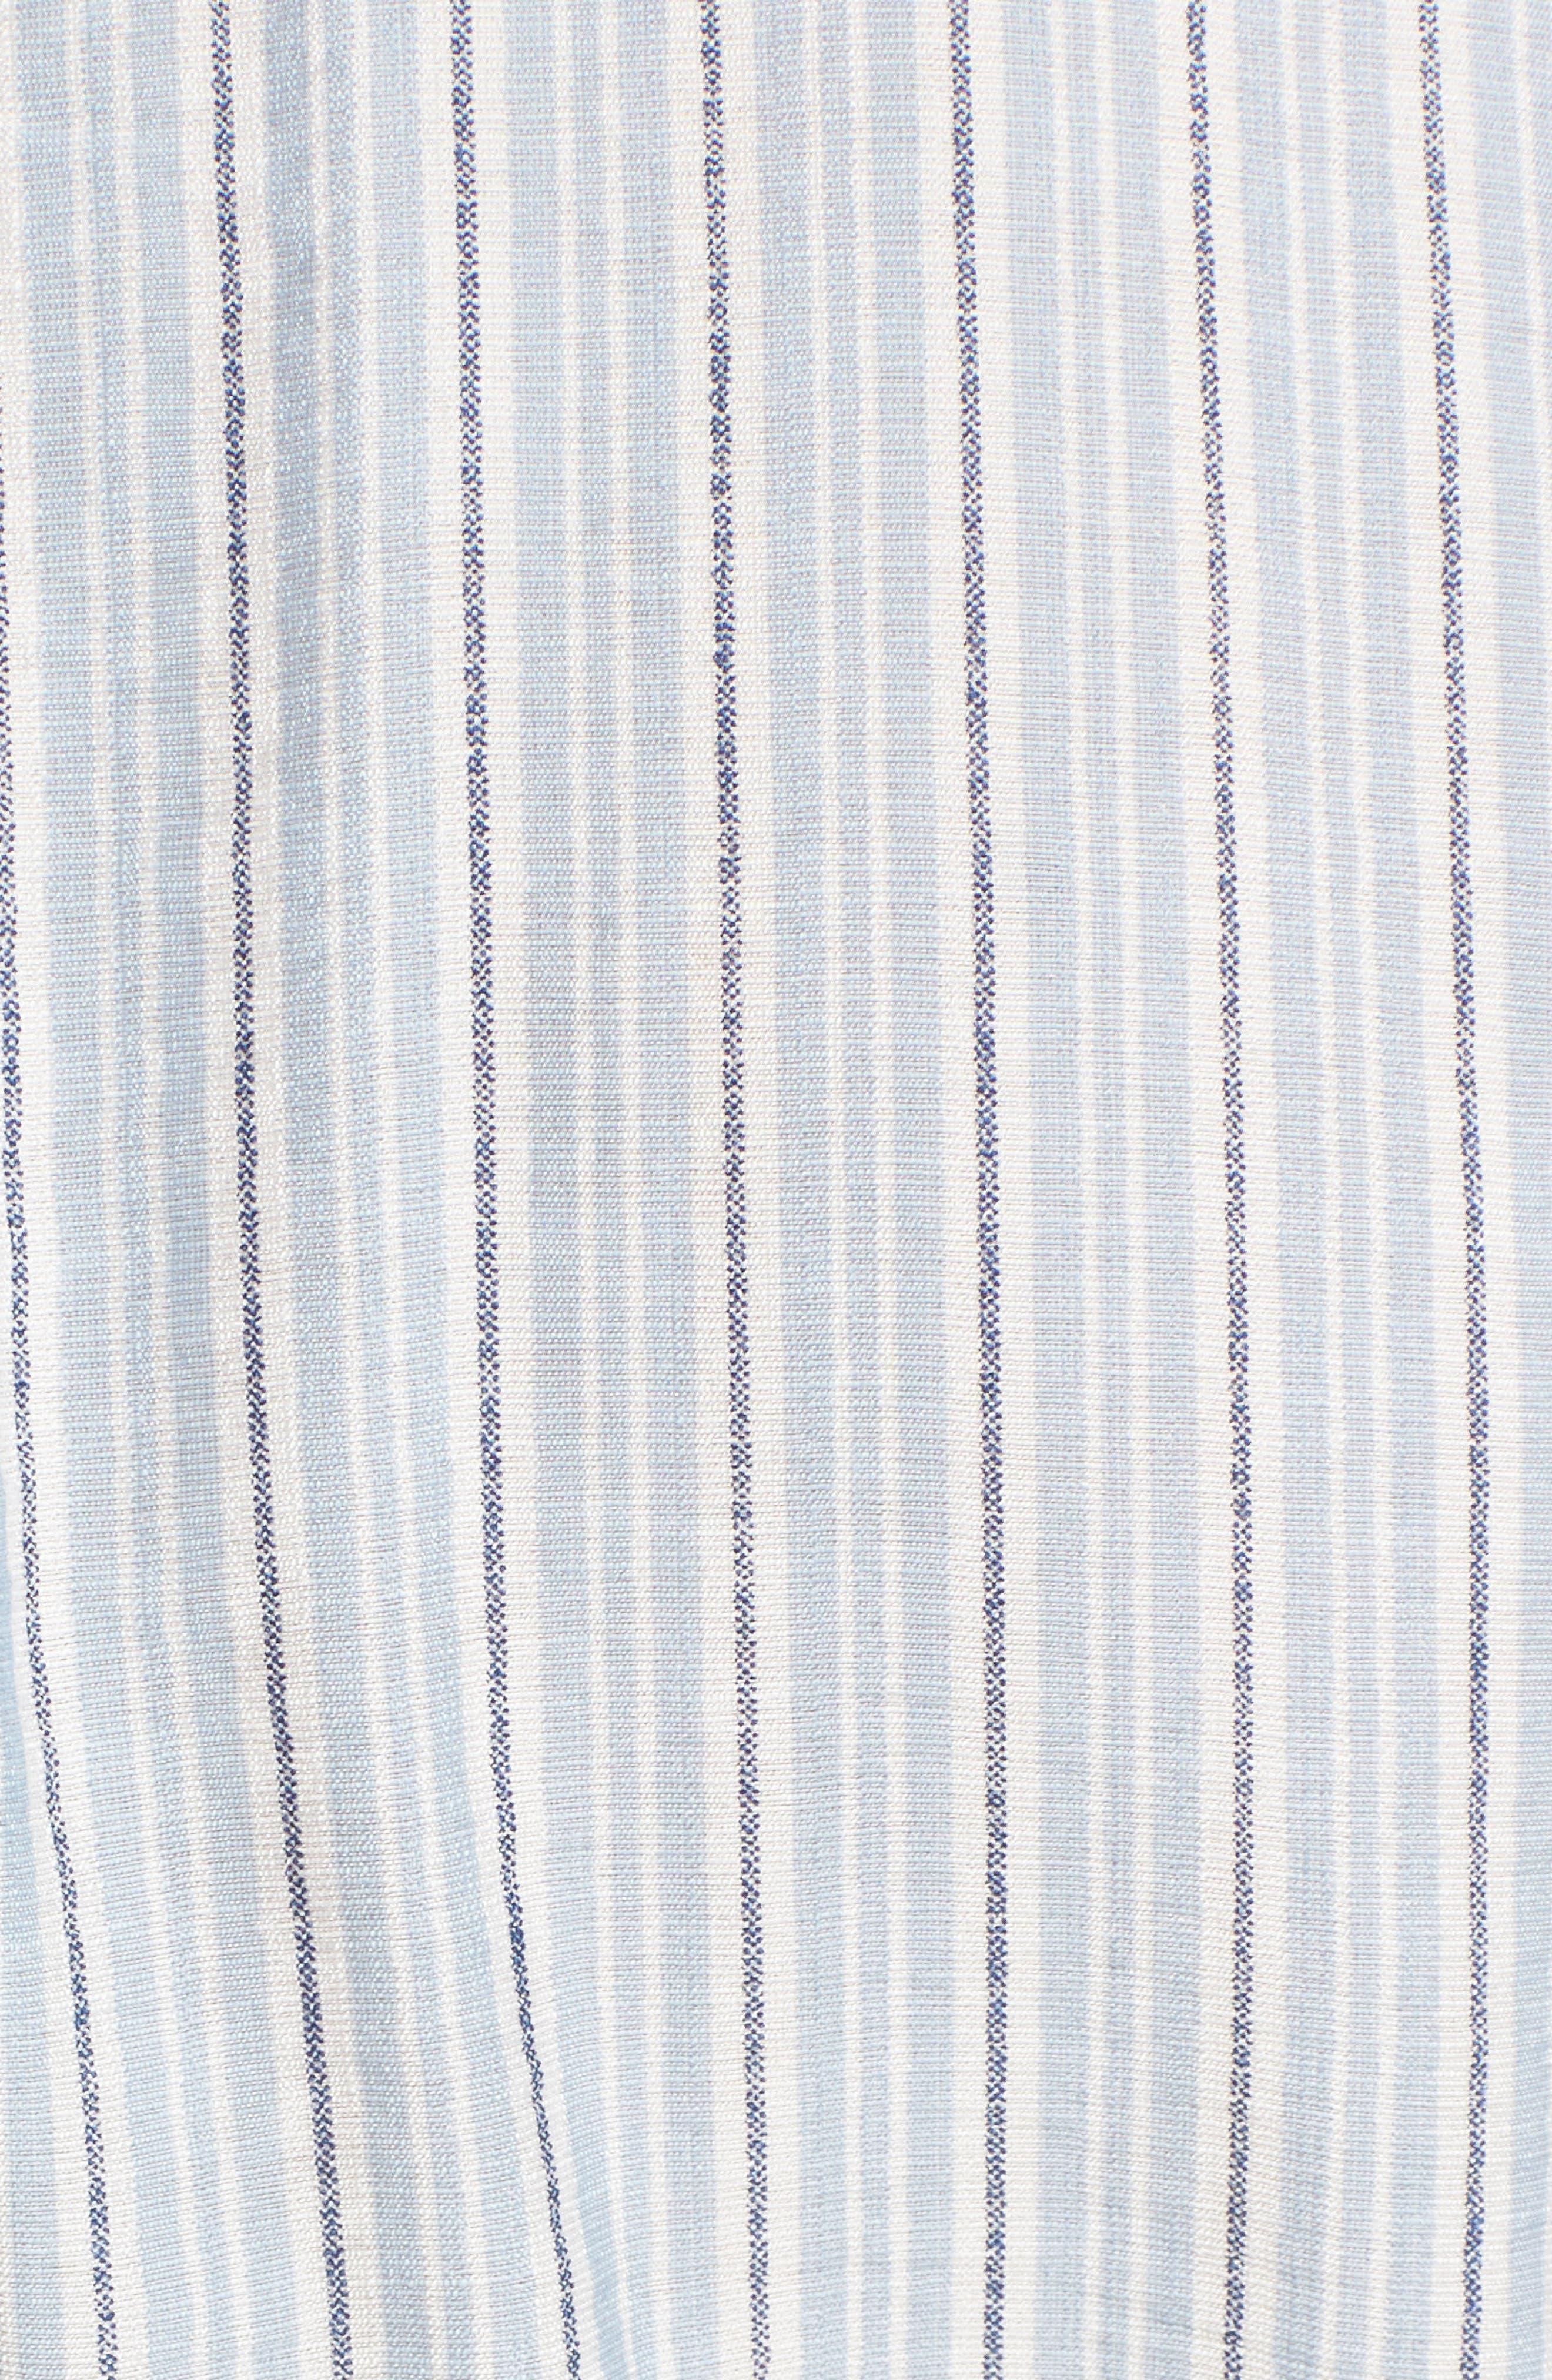 Stripe Ruffle Wrap Dress,                             Alternate thumbnail 5, color,                             400